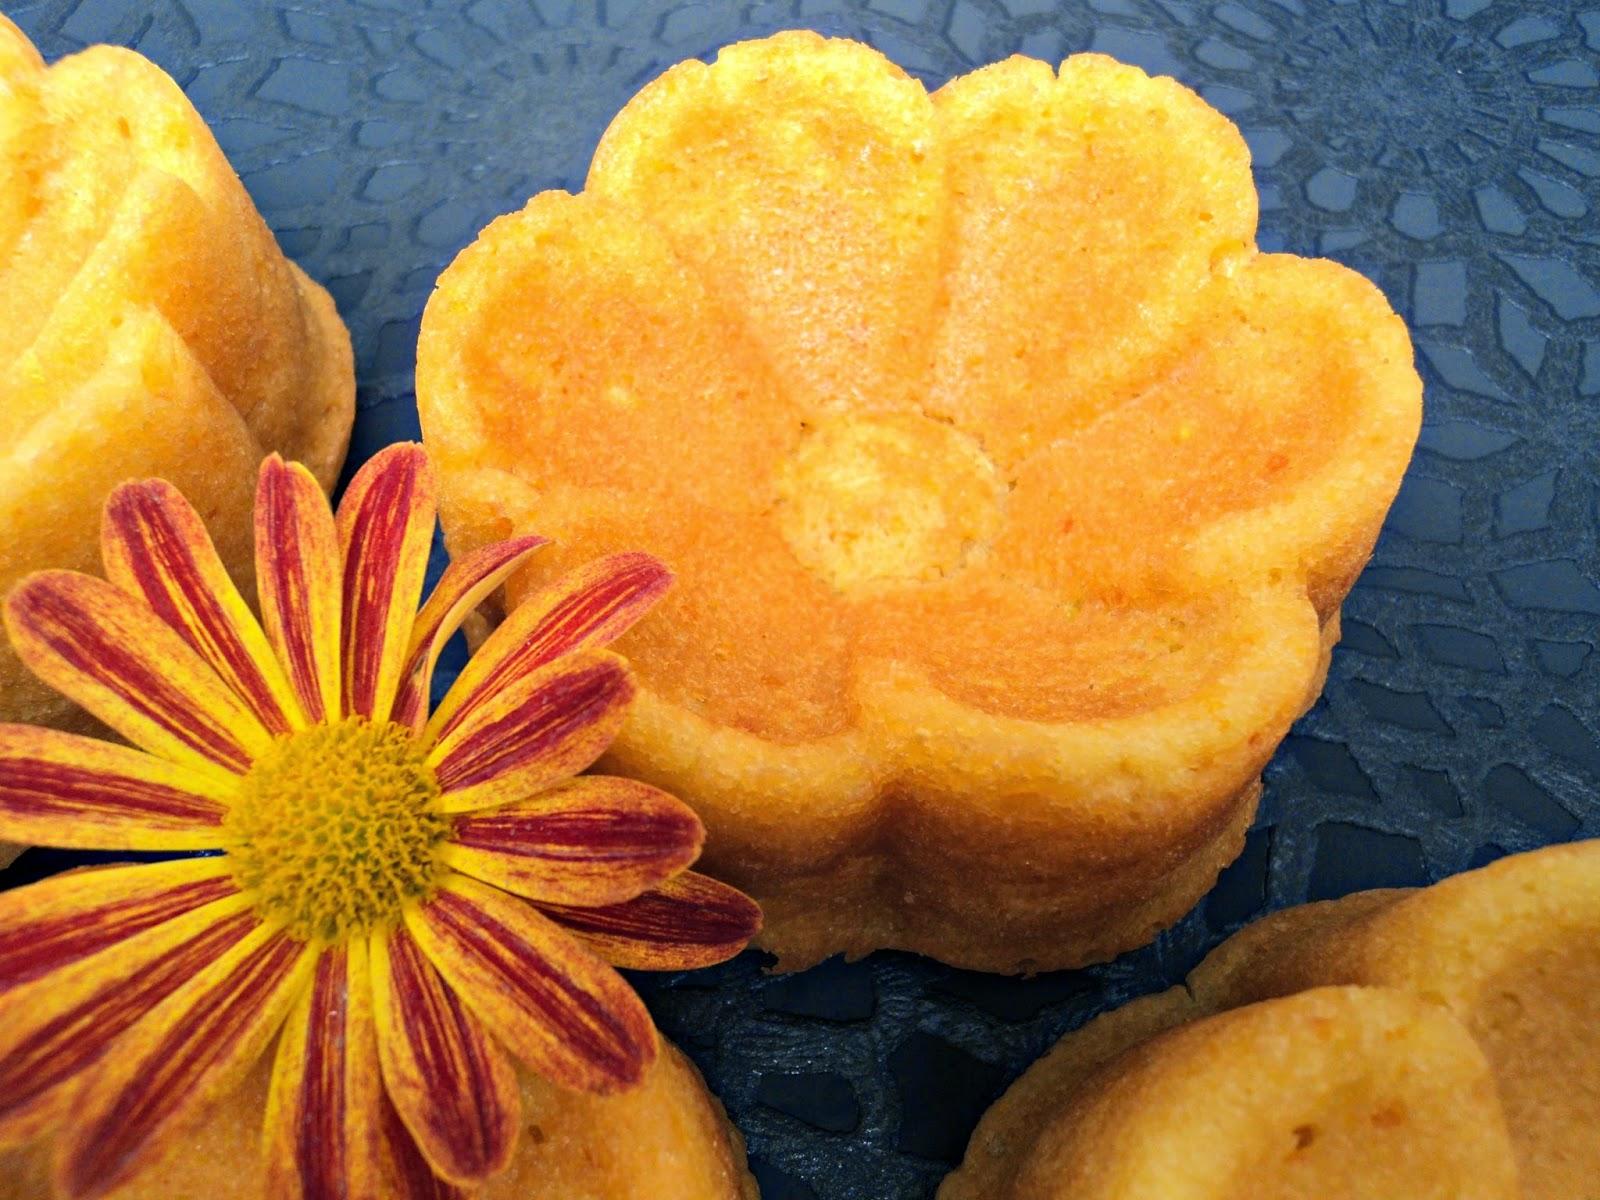 Margaritas, Bundt cake (Bizcocho) de naranja